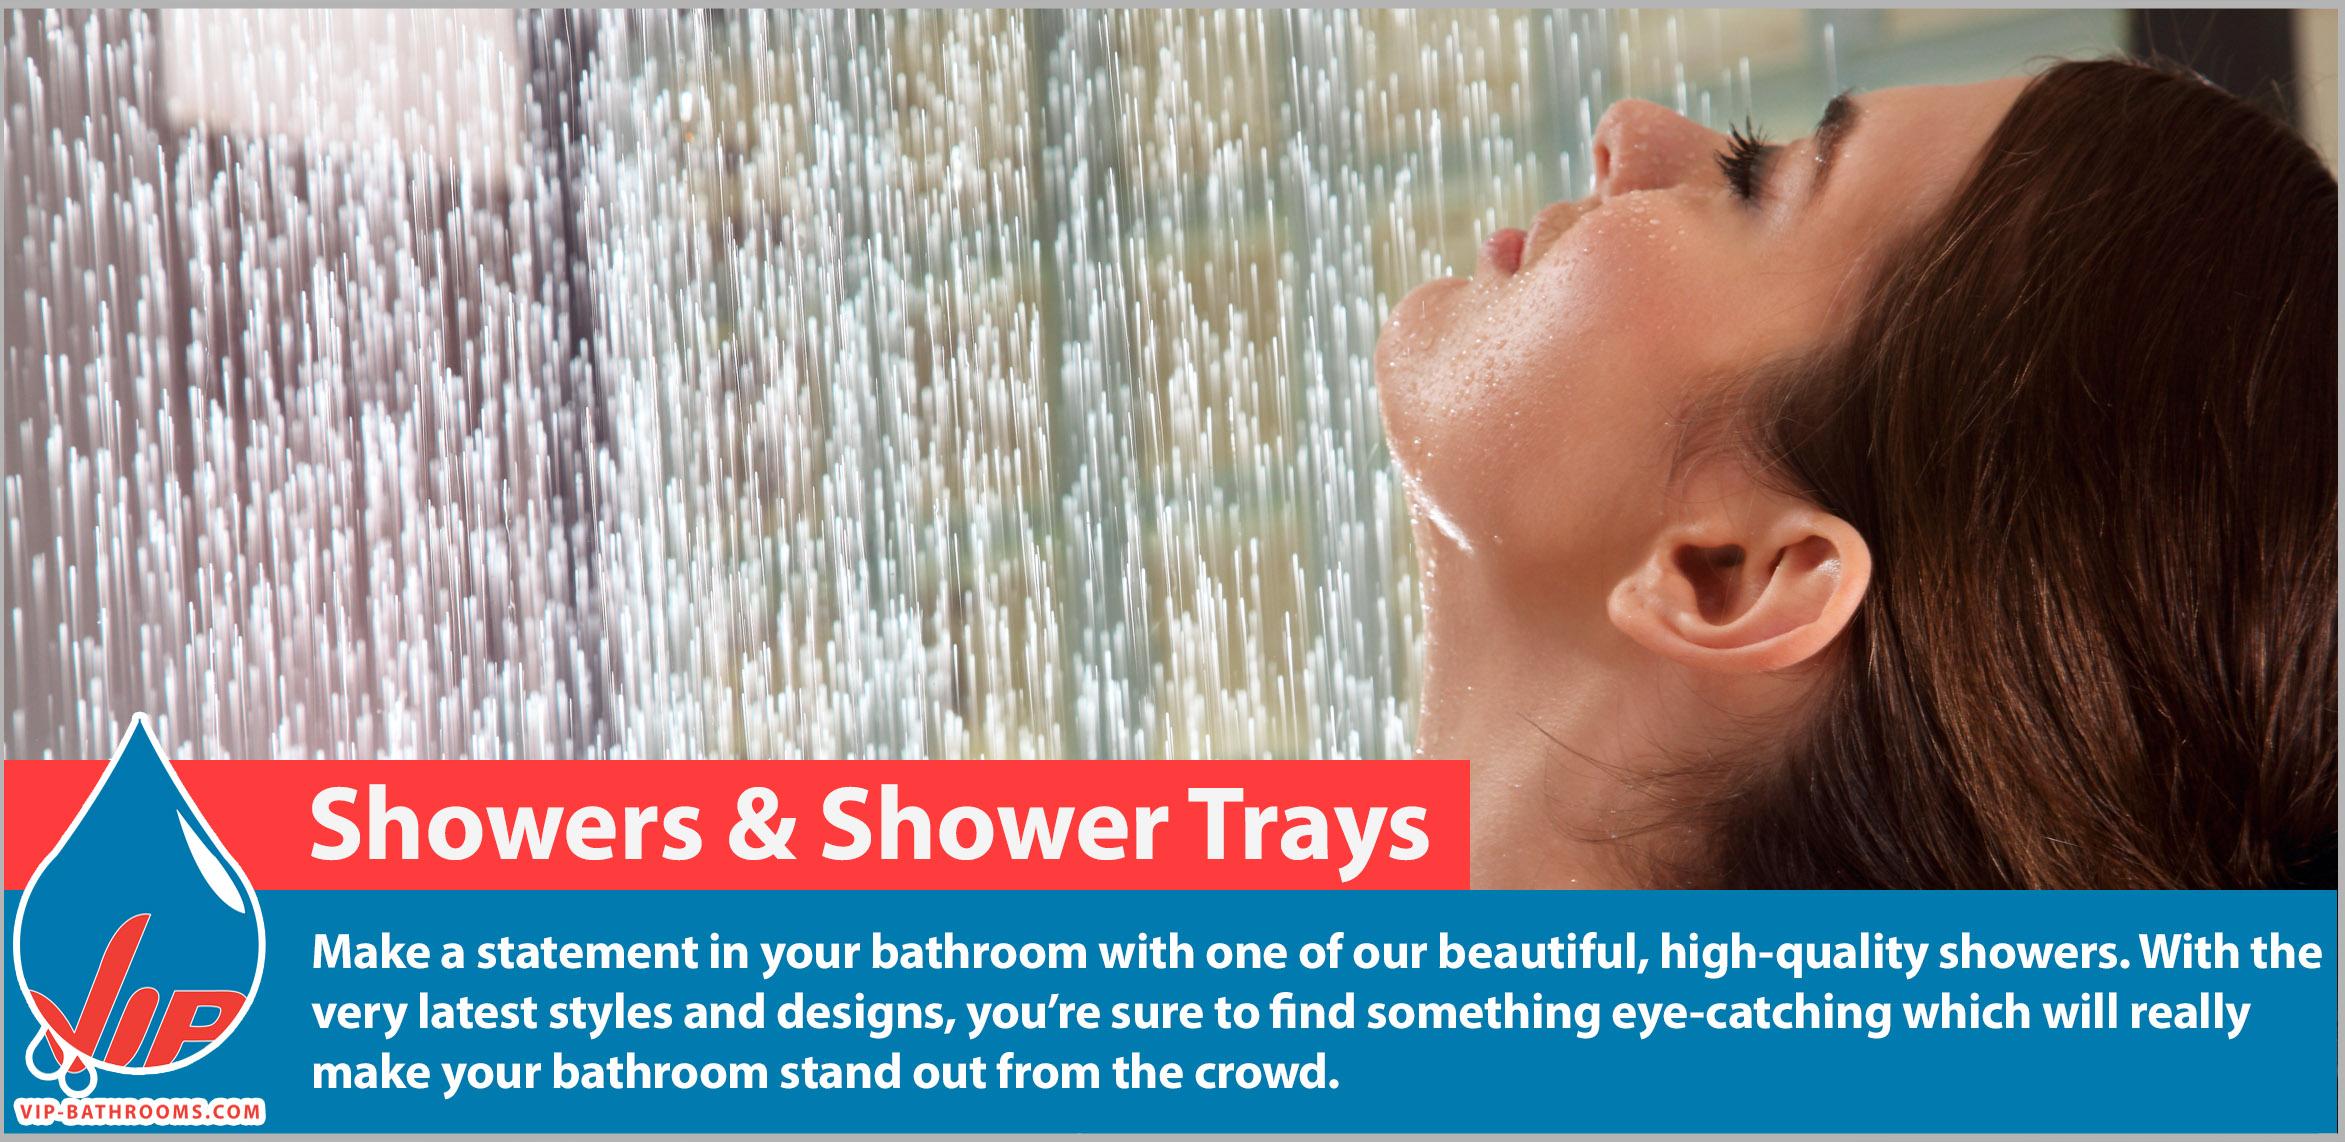 Showers & Shower Trays | VIP-Bathrooms.com